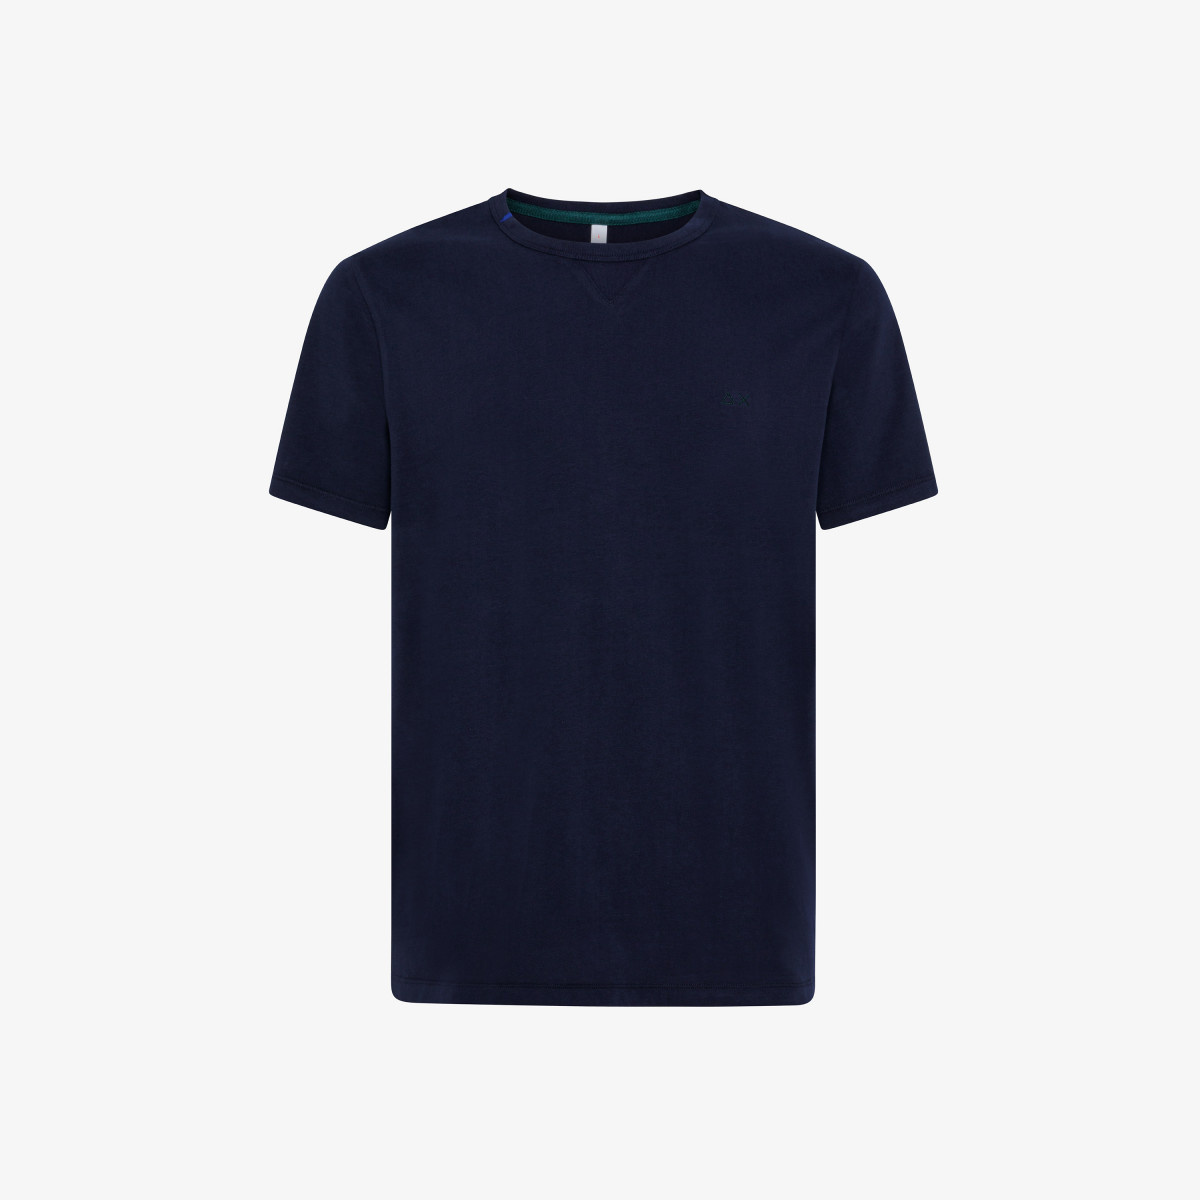 T-SHIRT ROUND NICKY S/S NAVY BLUE